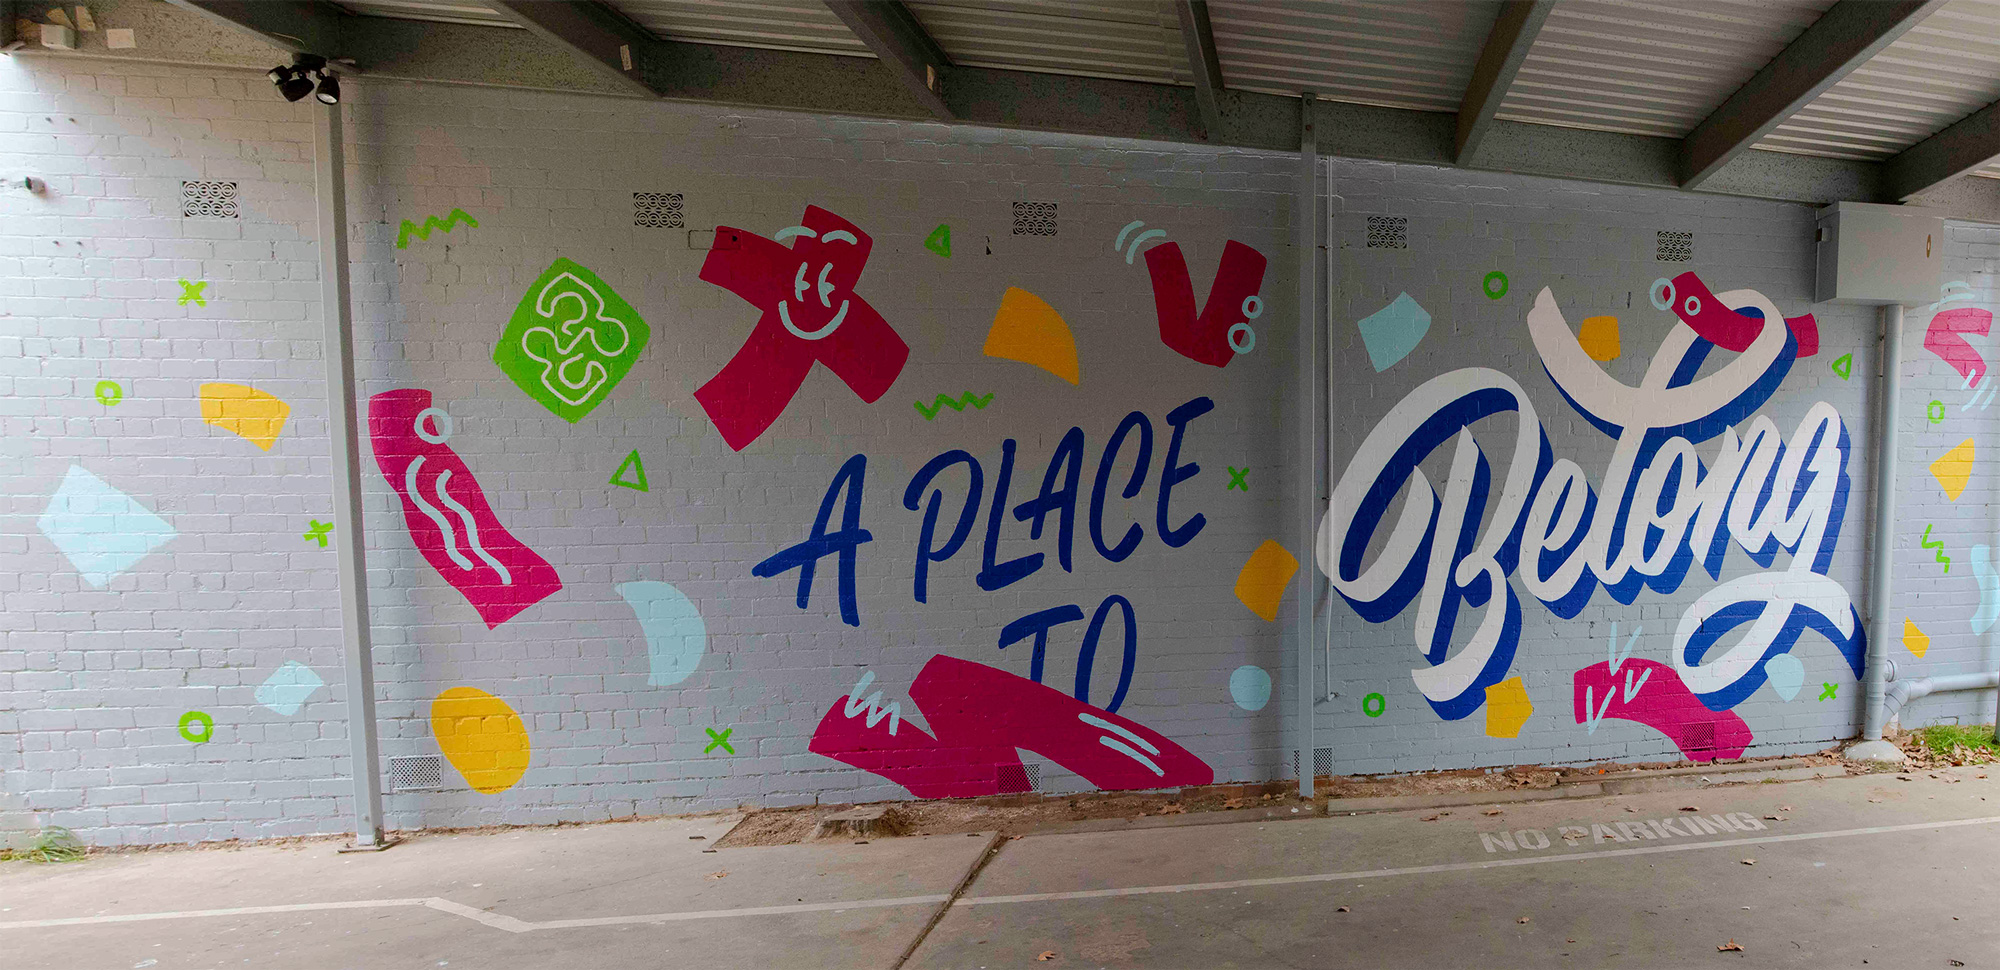 Headspace-Bendigo-Street-art-mural.jpg